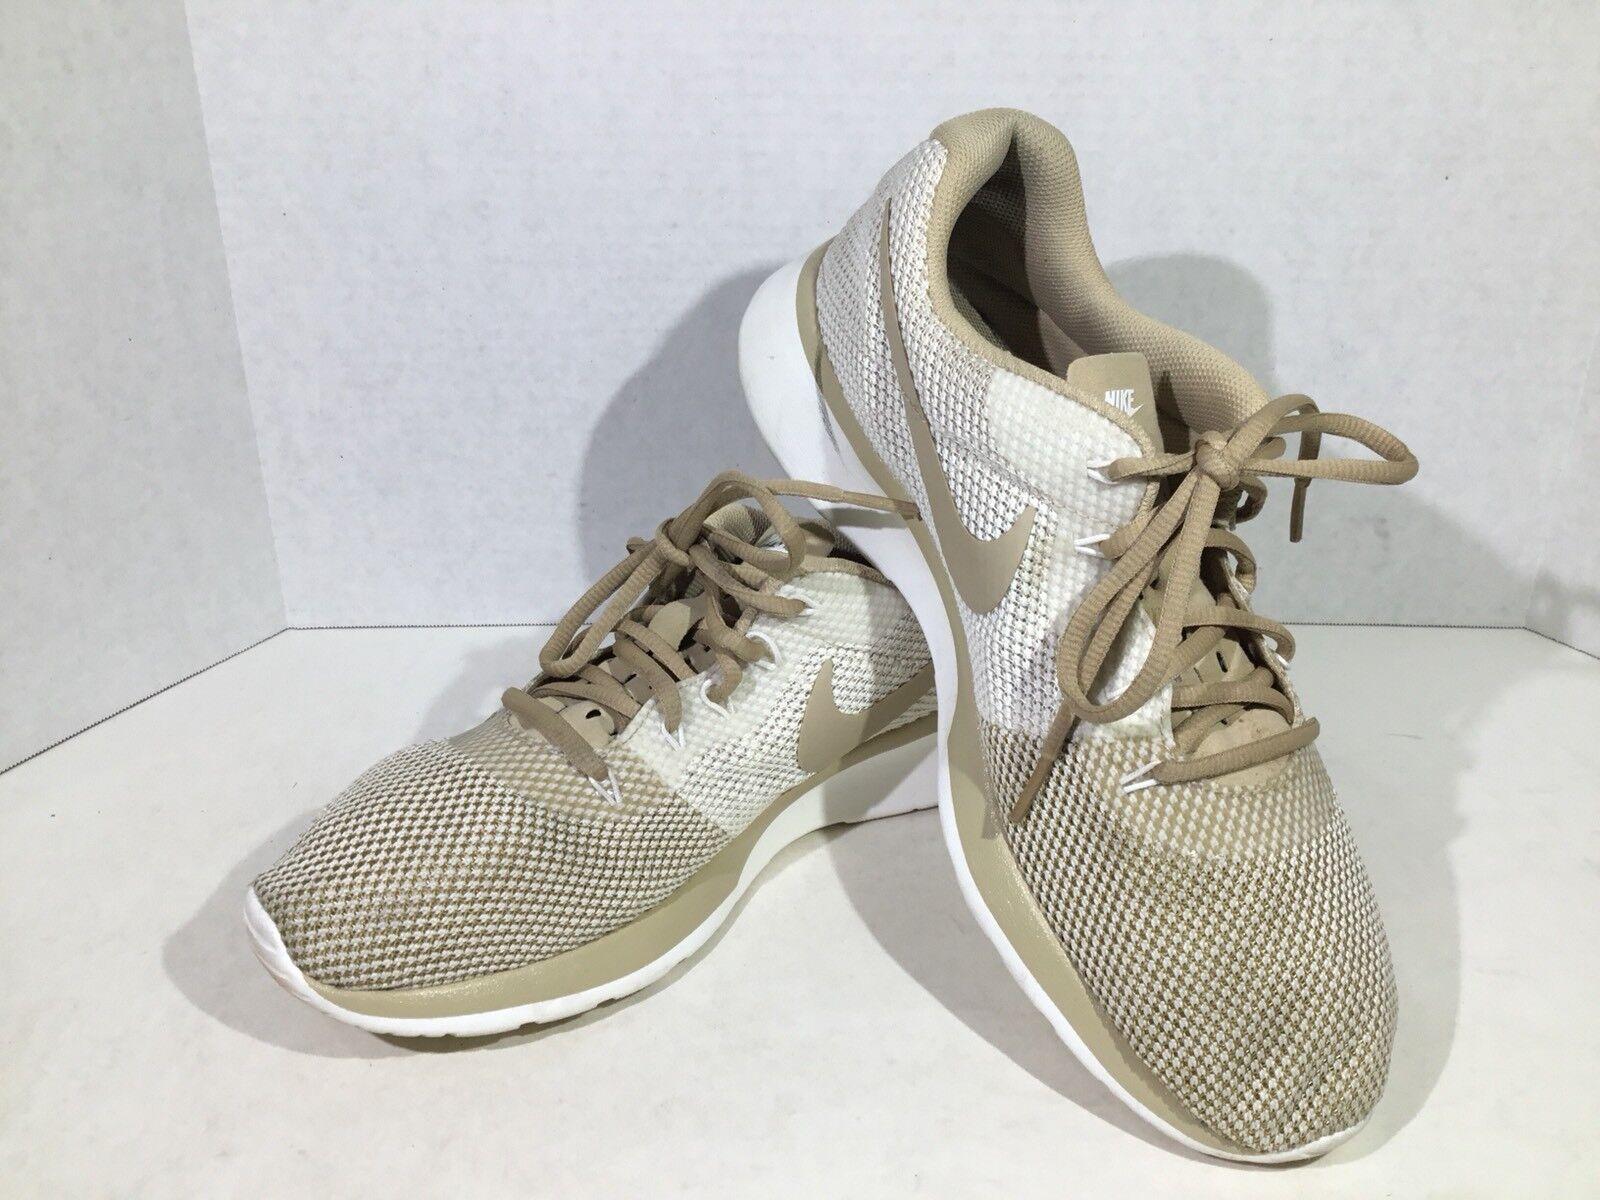 Nike Tanjun Racer 921668-200 Womens Sz 10 Mushroom Running Athletic Shoes F4-841